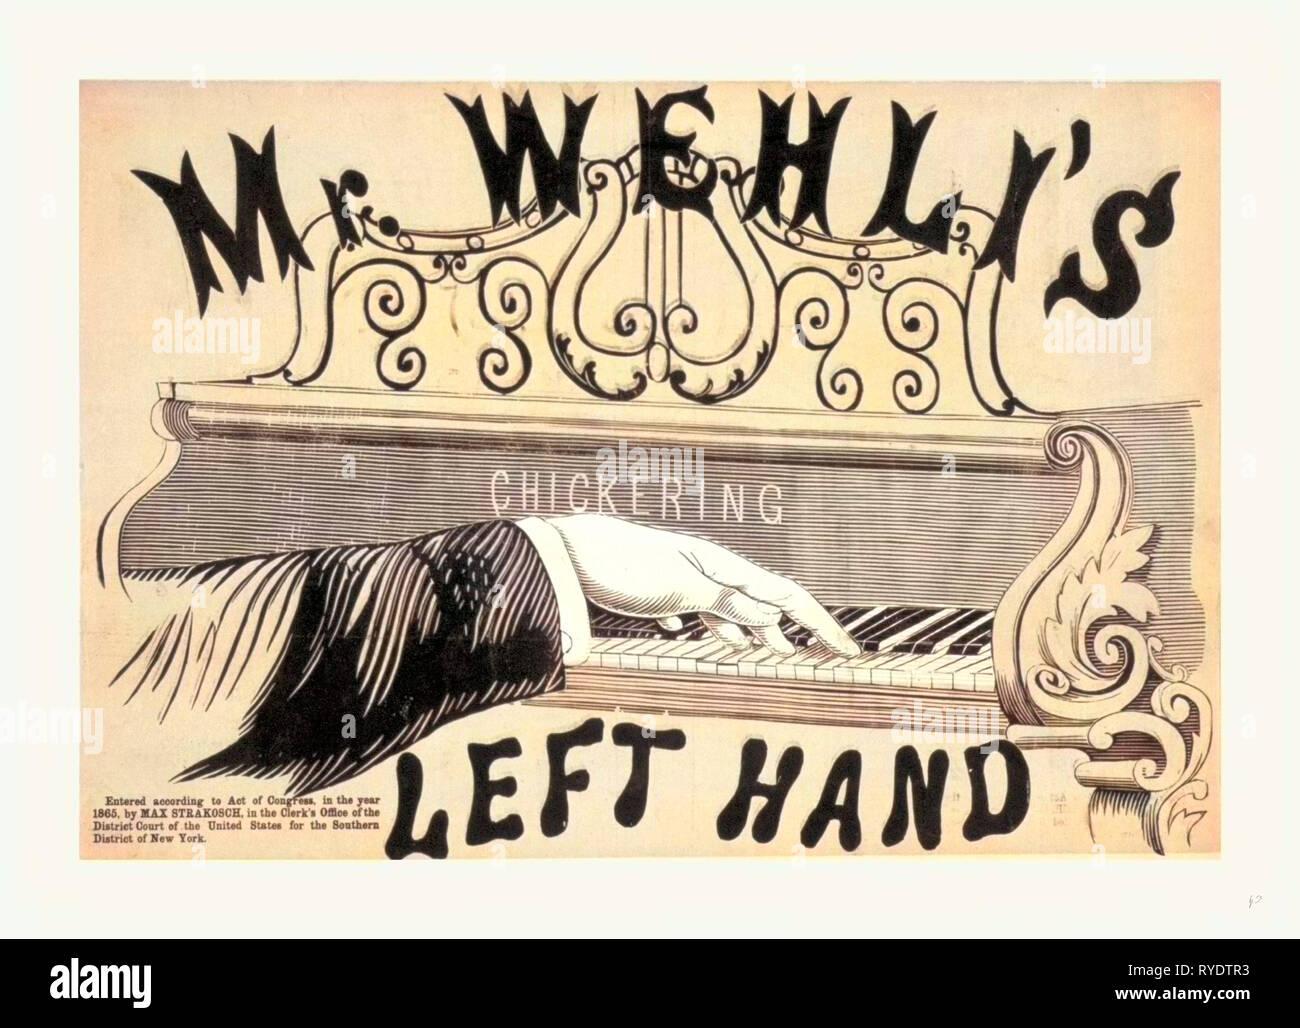 Mr. Wehli's Left Hand, 1865 - Stock Image